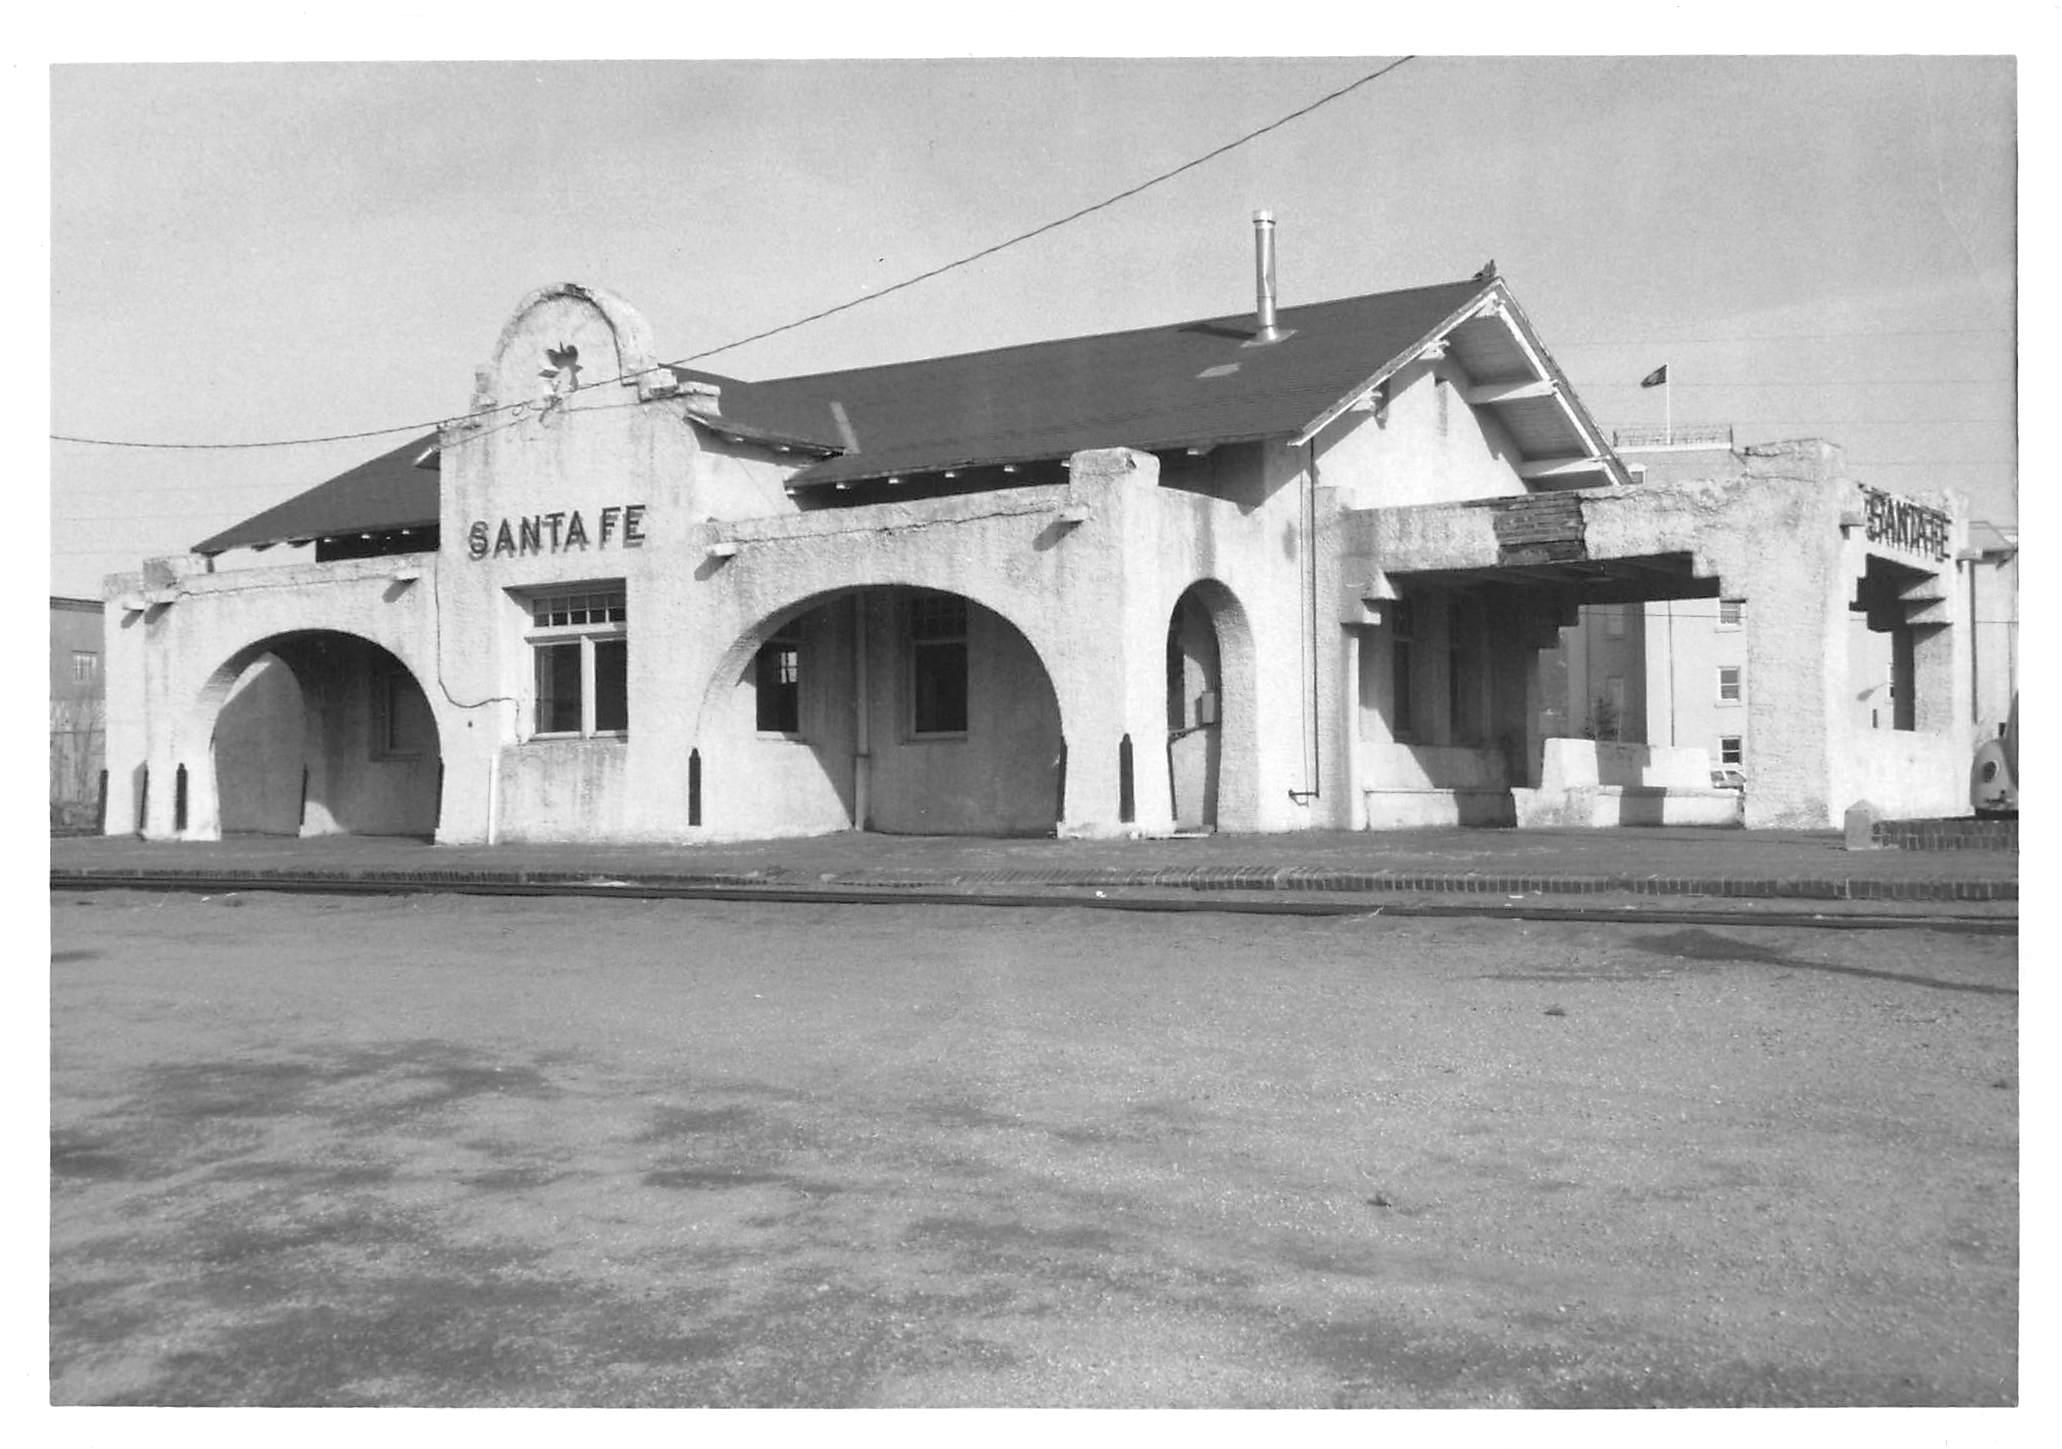 Atchison, Topeka & Santa Fe Railway Depot, Railyard